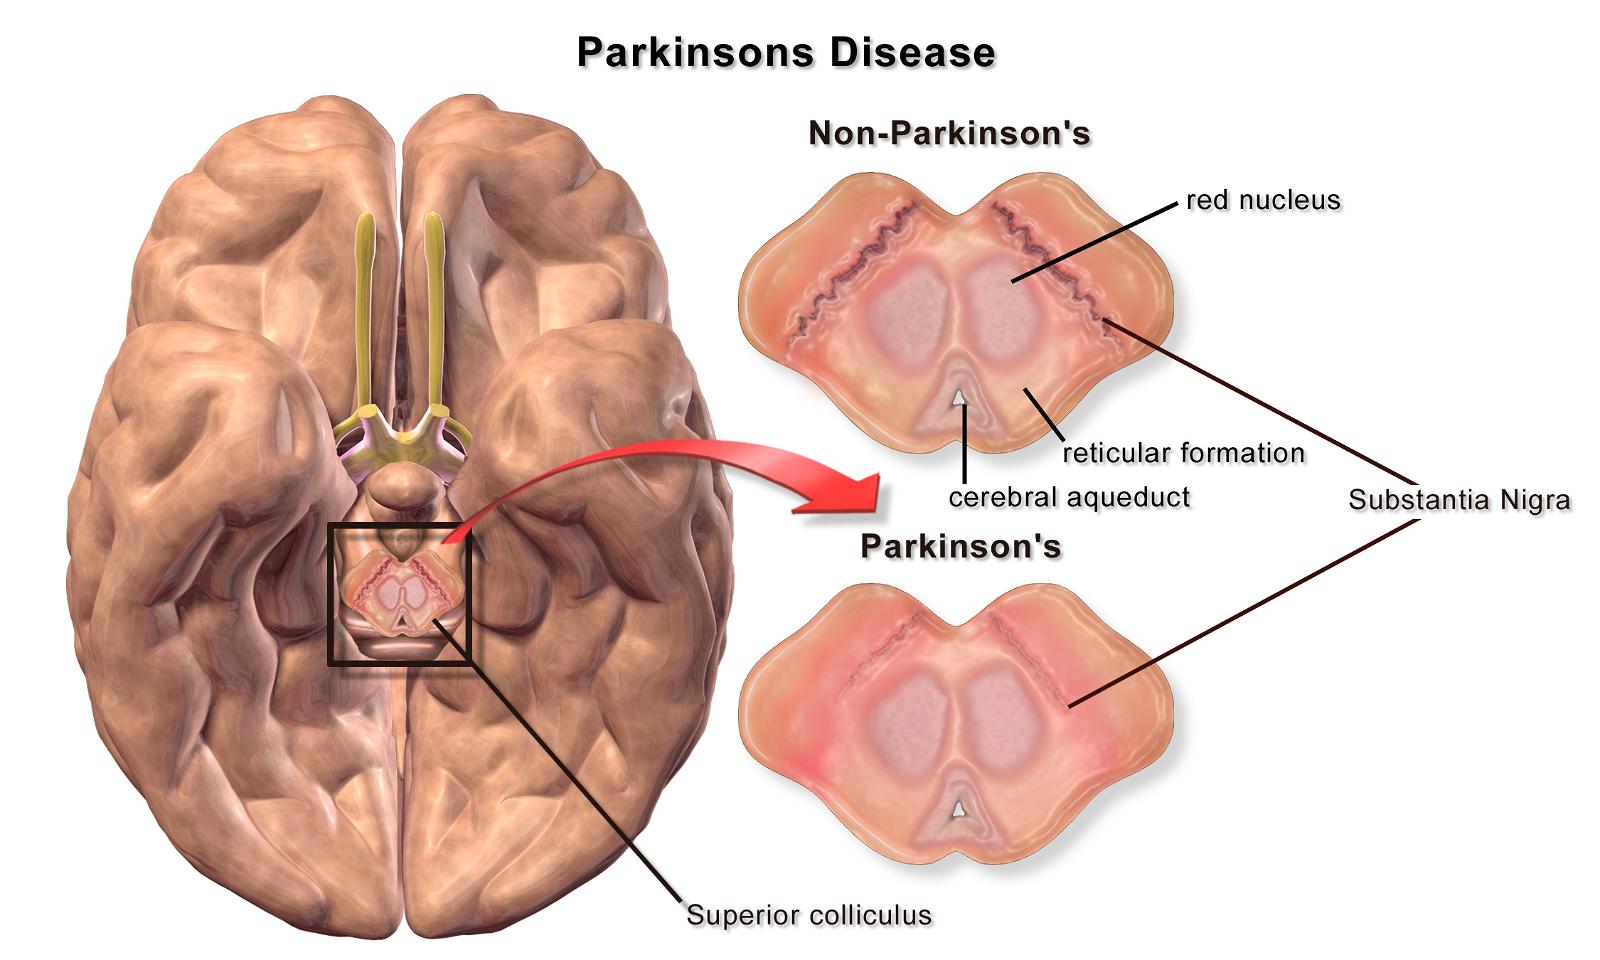 VA Disability for Parkinson's Disease